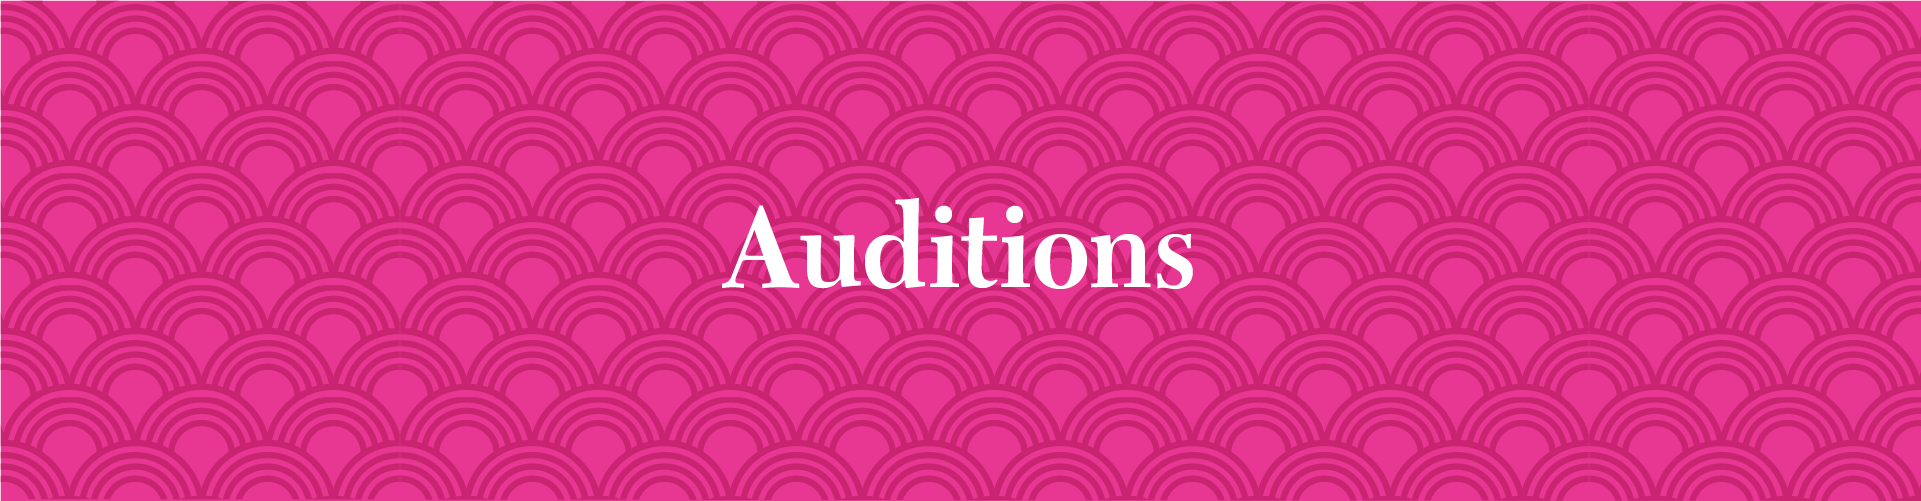 Auditions | Opera Columbus